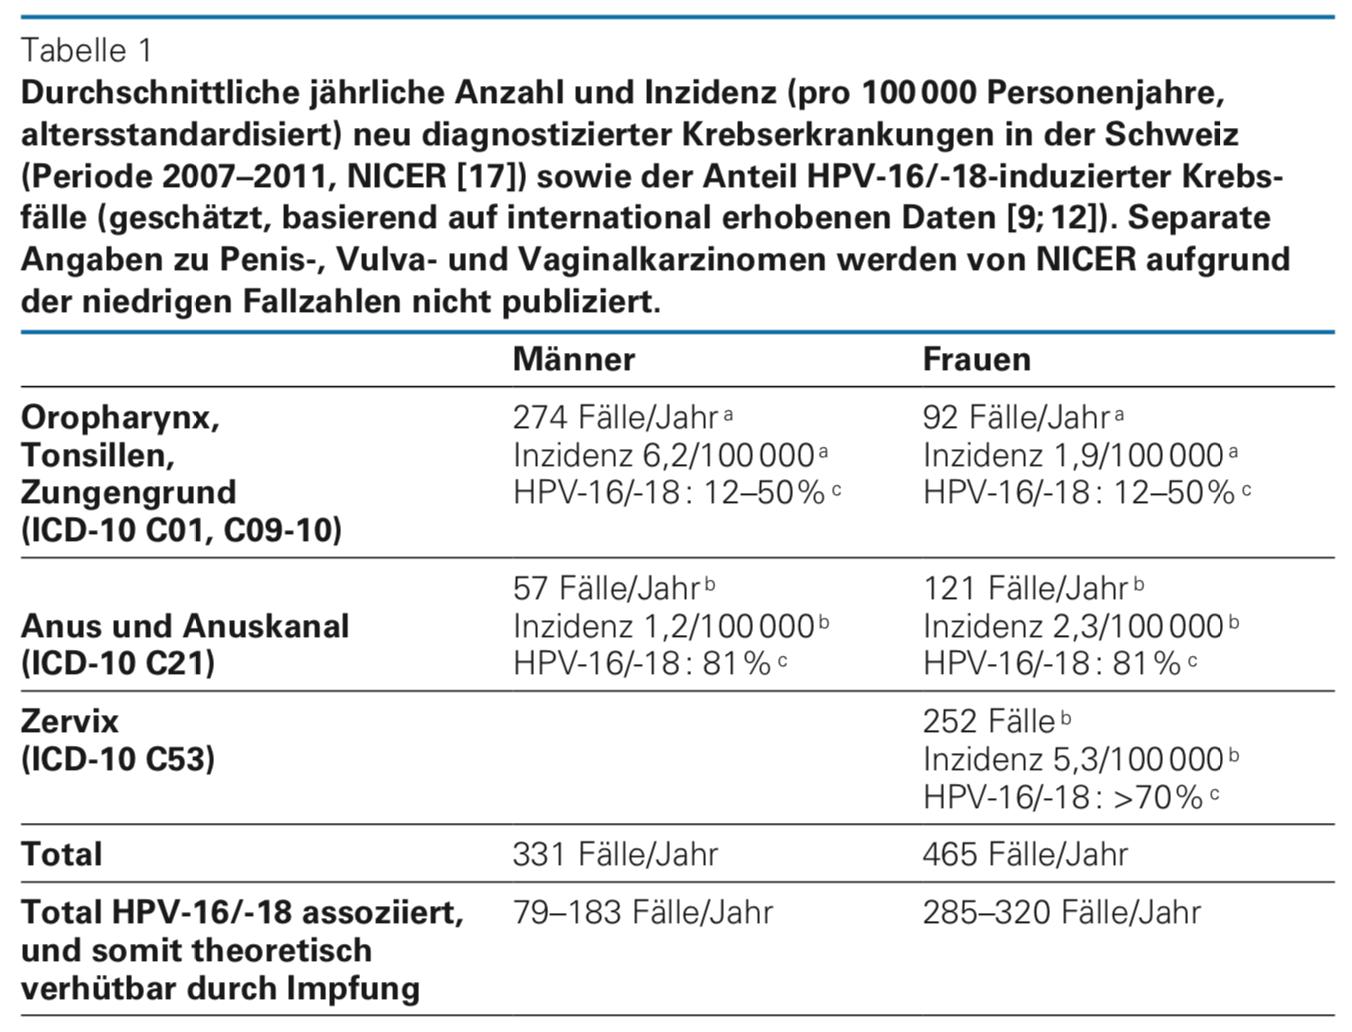 hpv impfung jungen unnotig cancer pulmonar primitiv